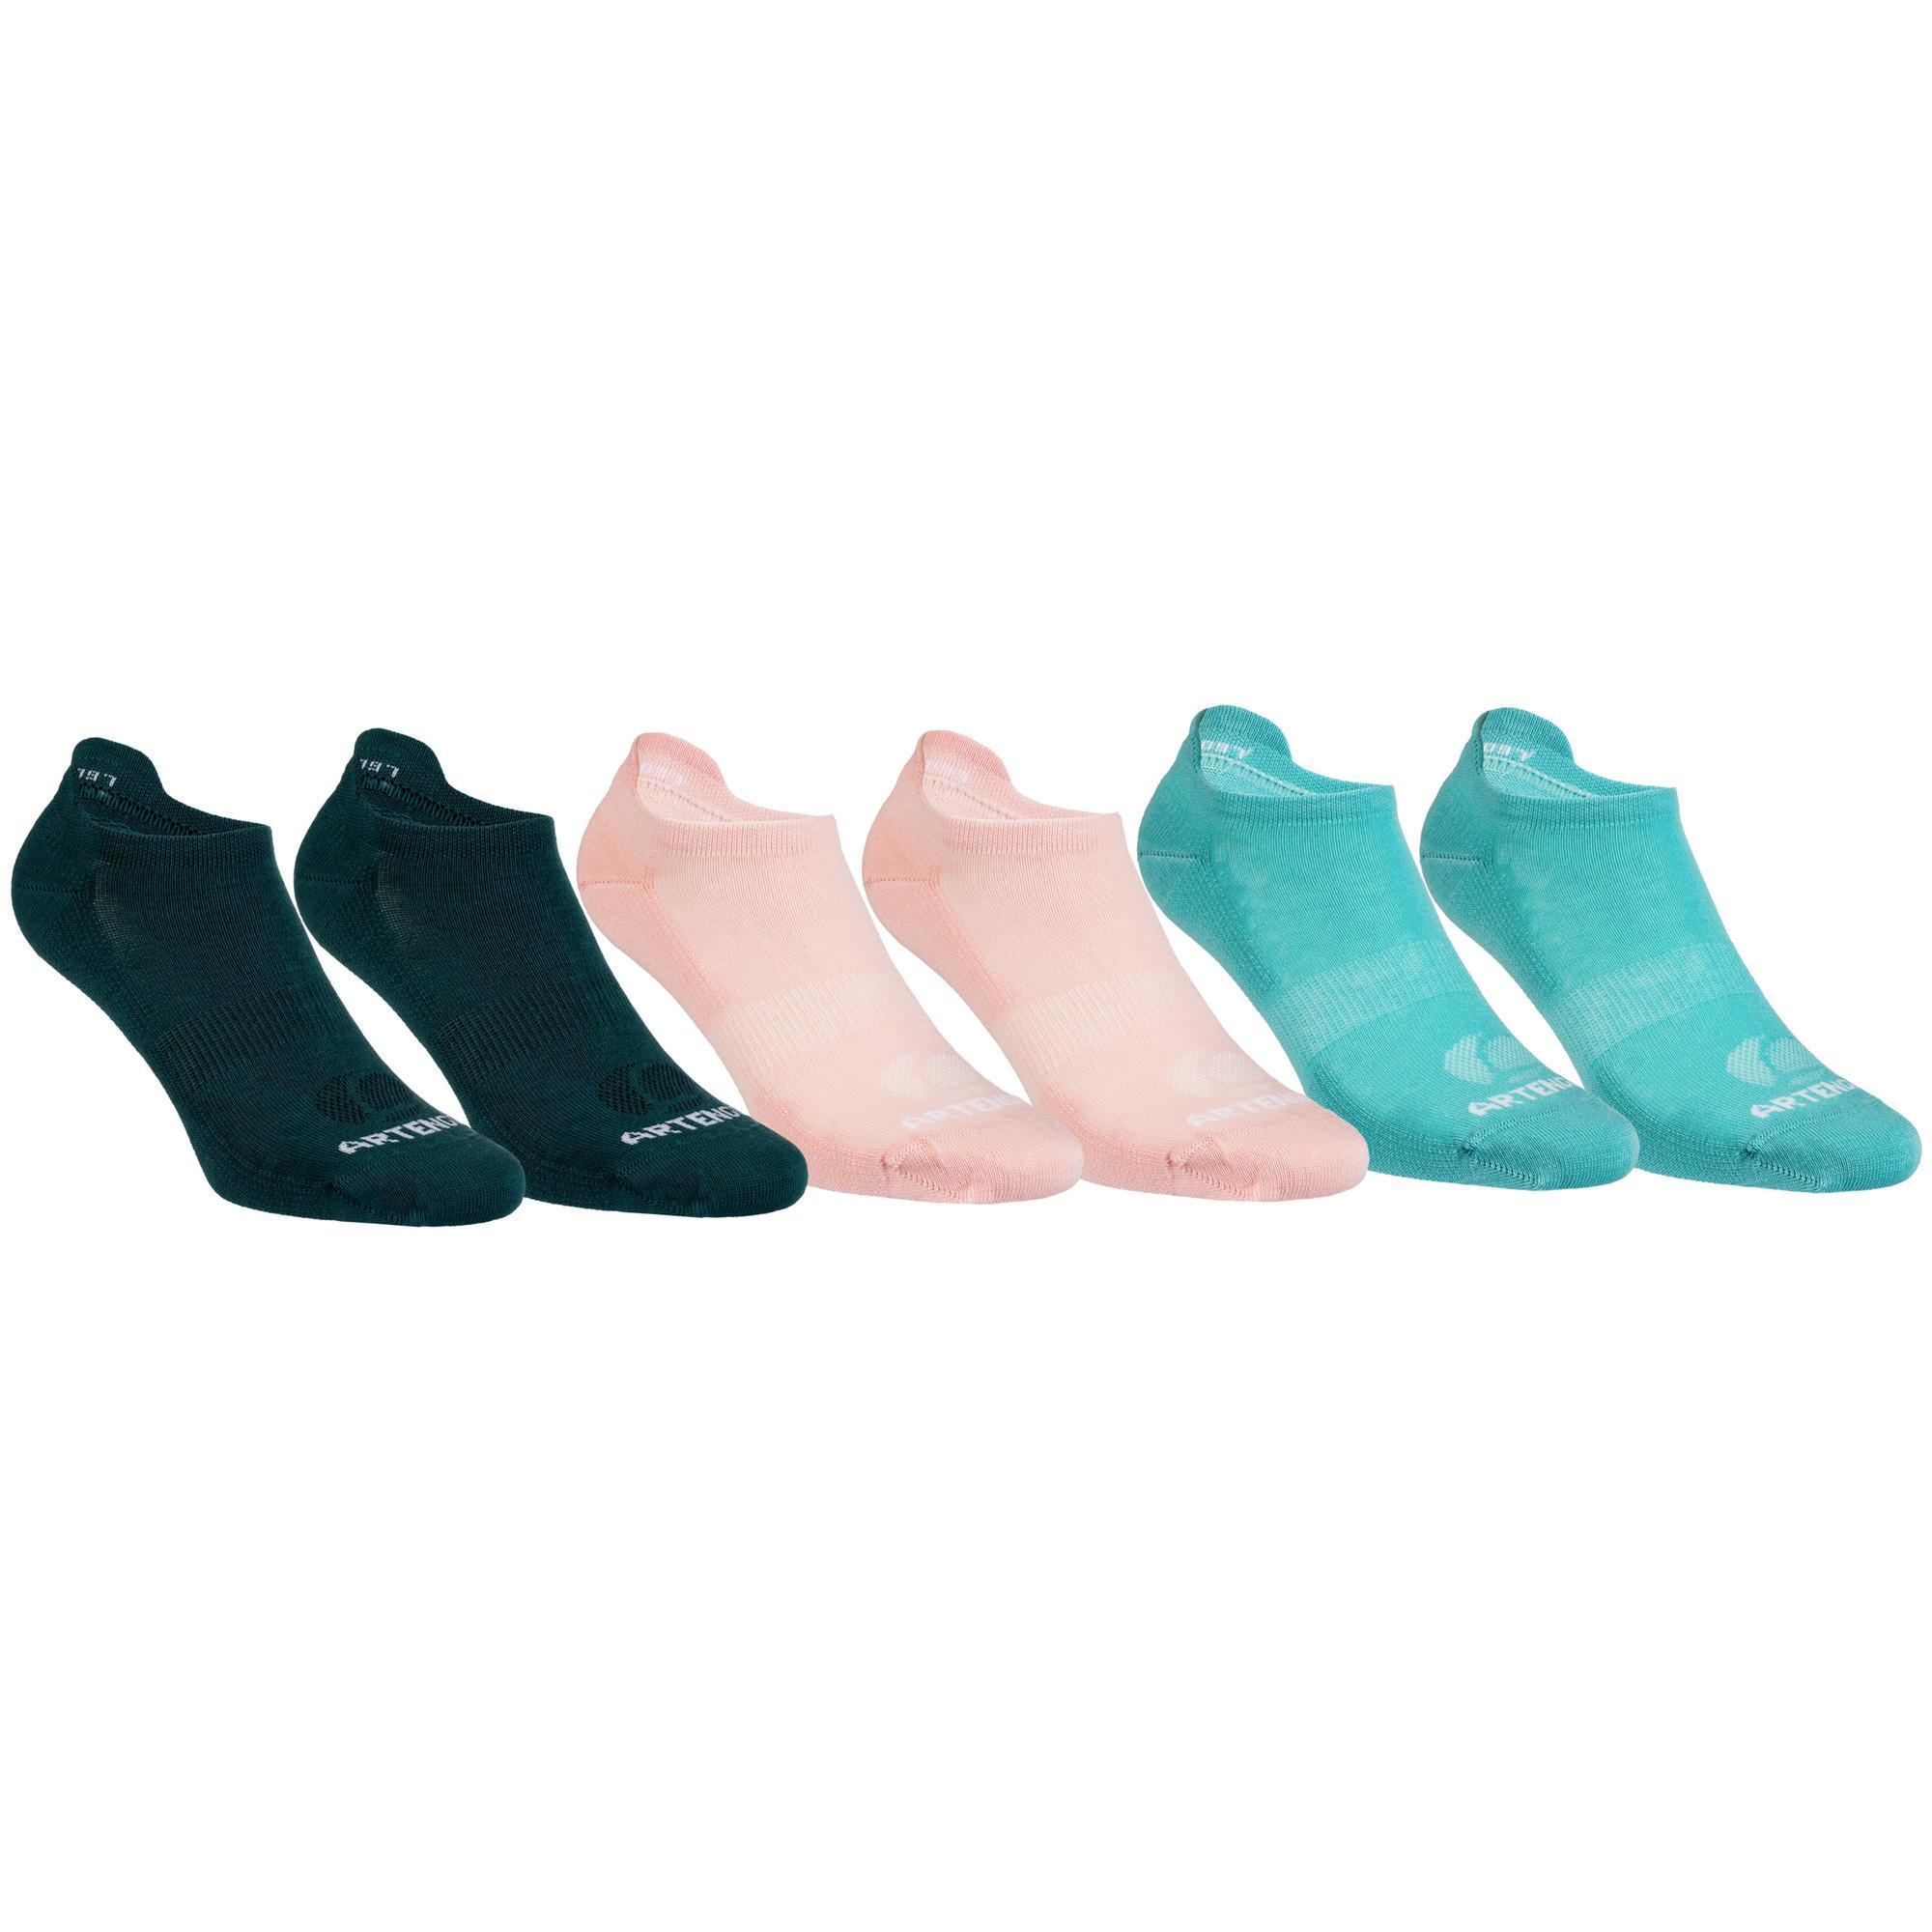 Tennissocken RS160 Low Erwachsene 6er-Pack grün/rosa | Sportbekleidung > Funktionswäsche > Sportsocken | Baumwolle | Artengo